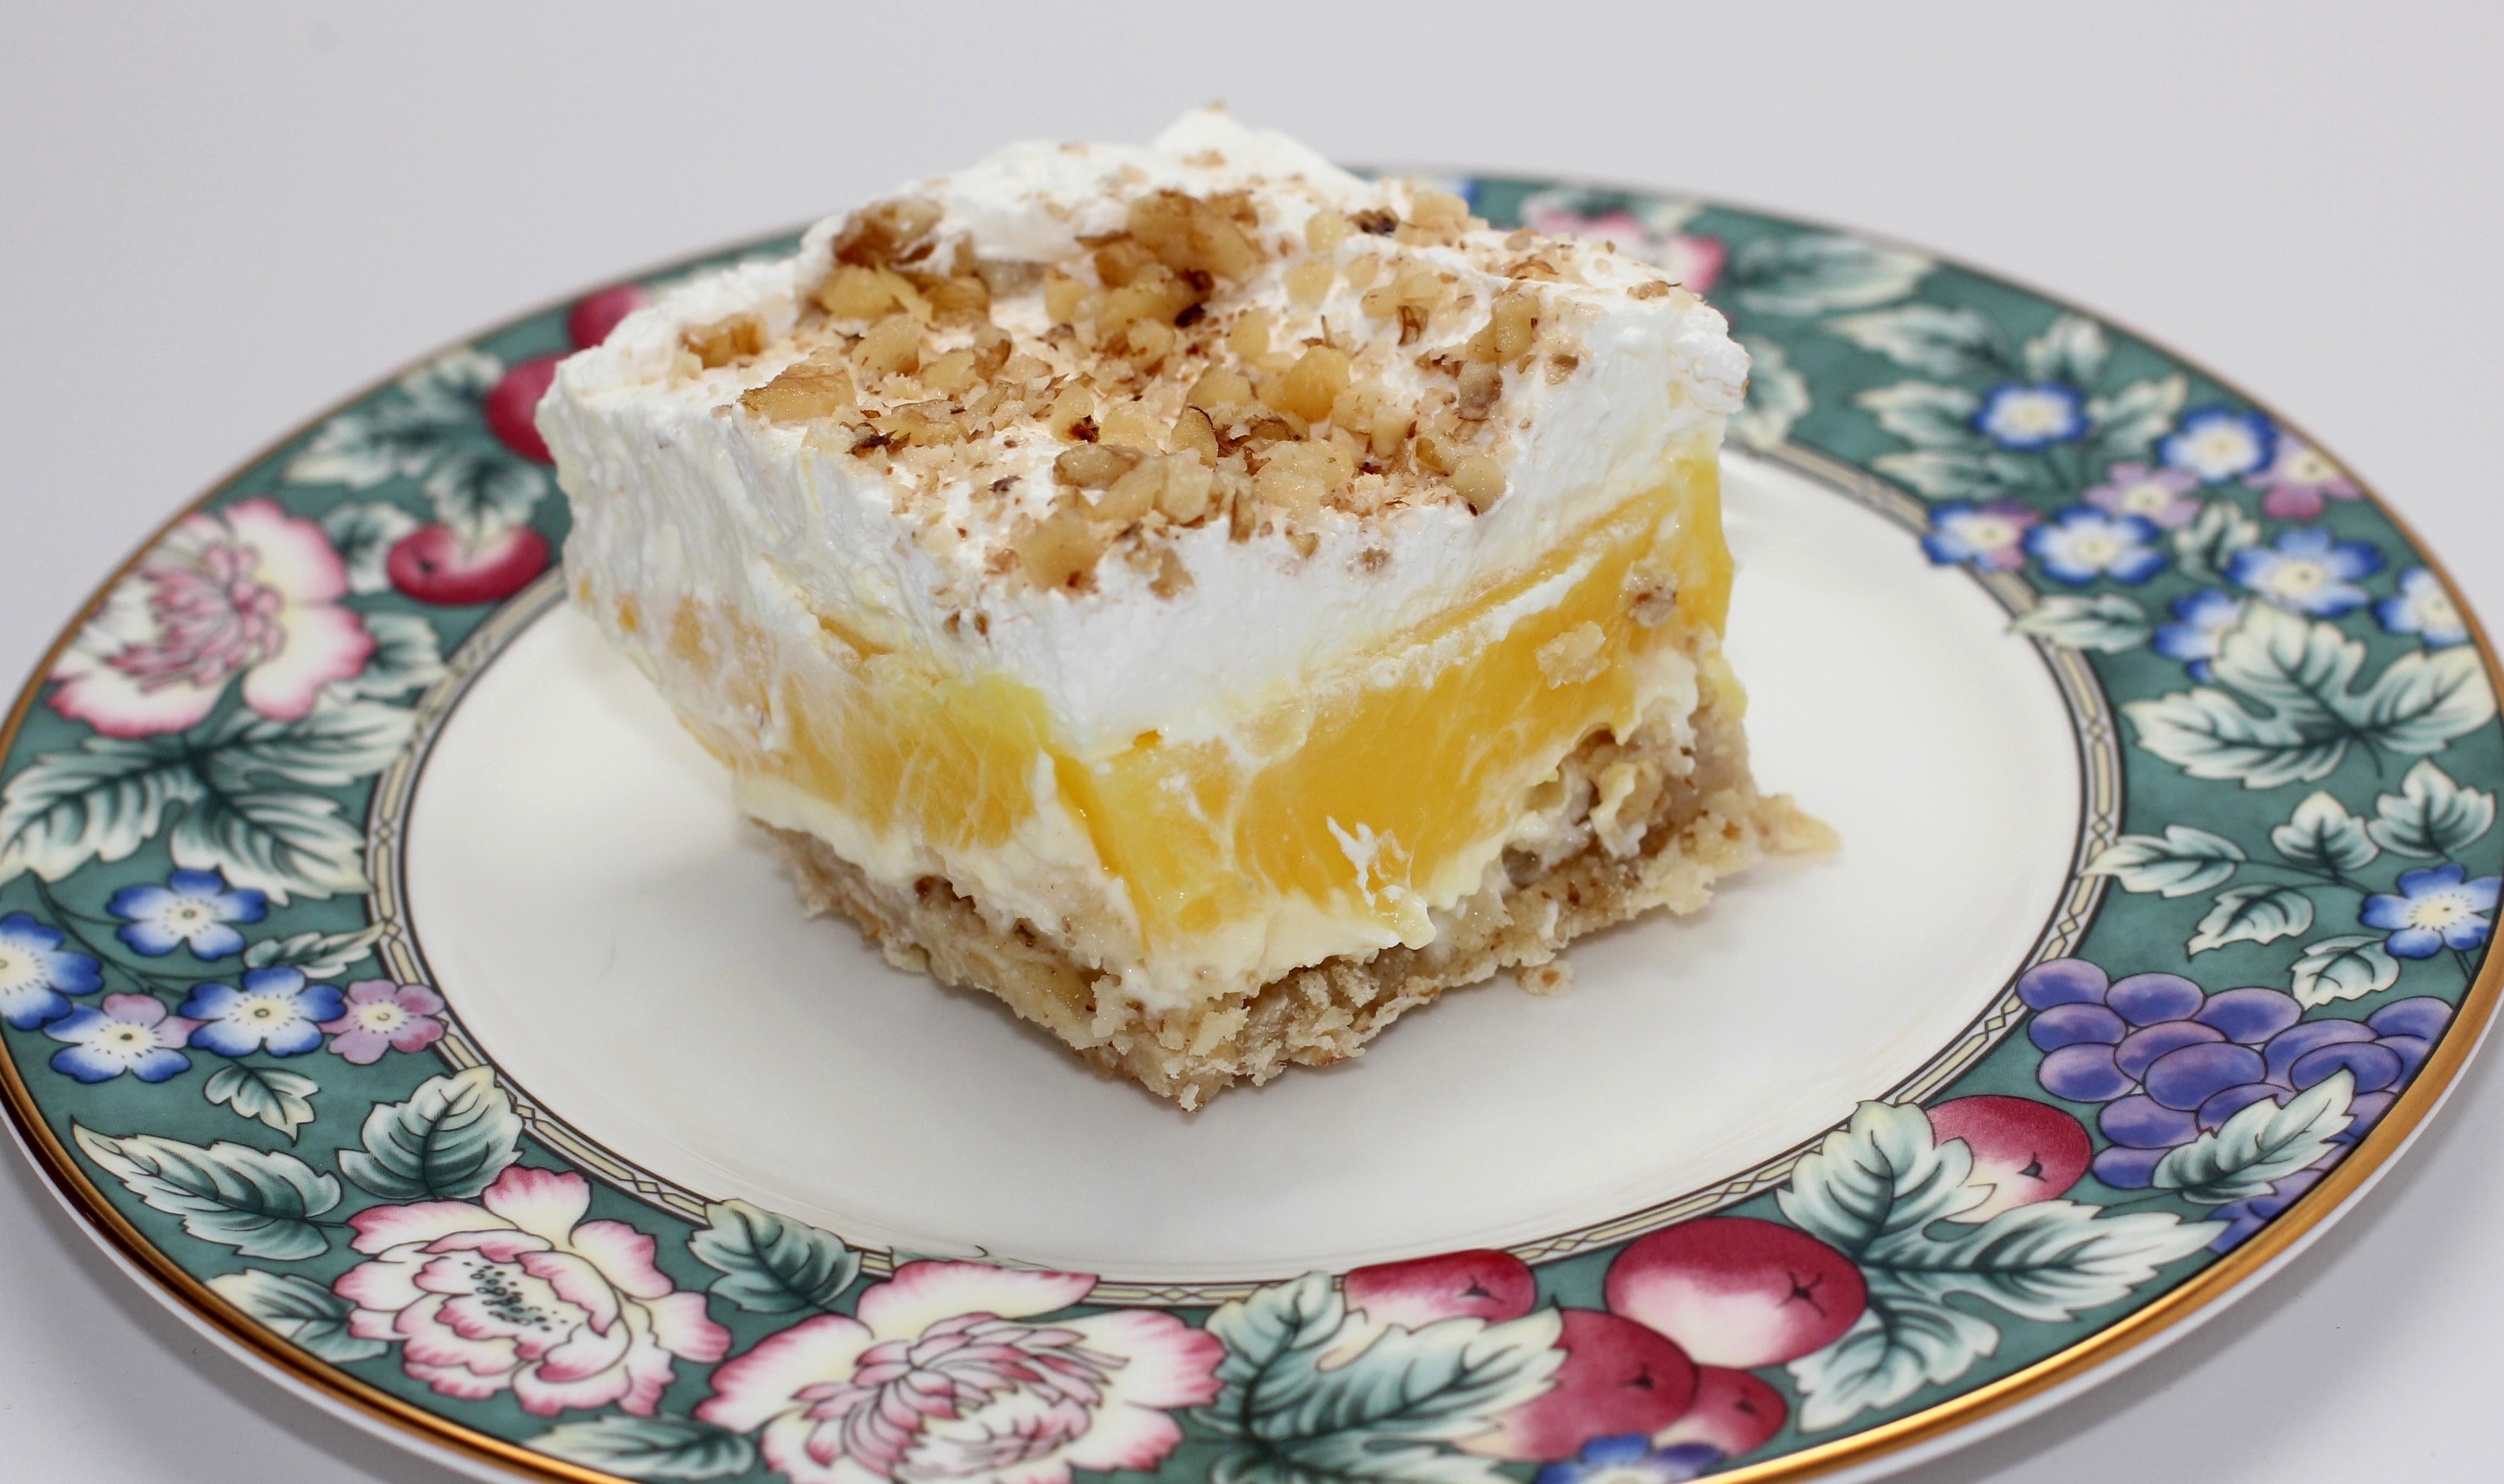 Cool Dessert Recipes  Cool Lemon Dessert Erica s Recipes